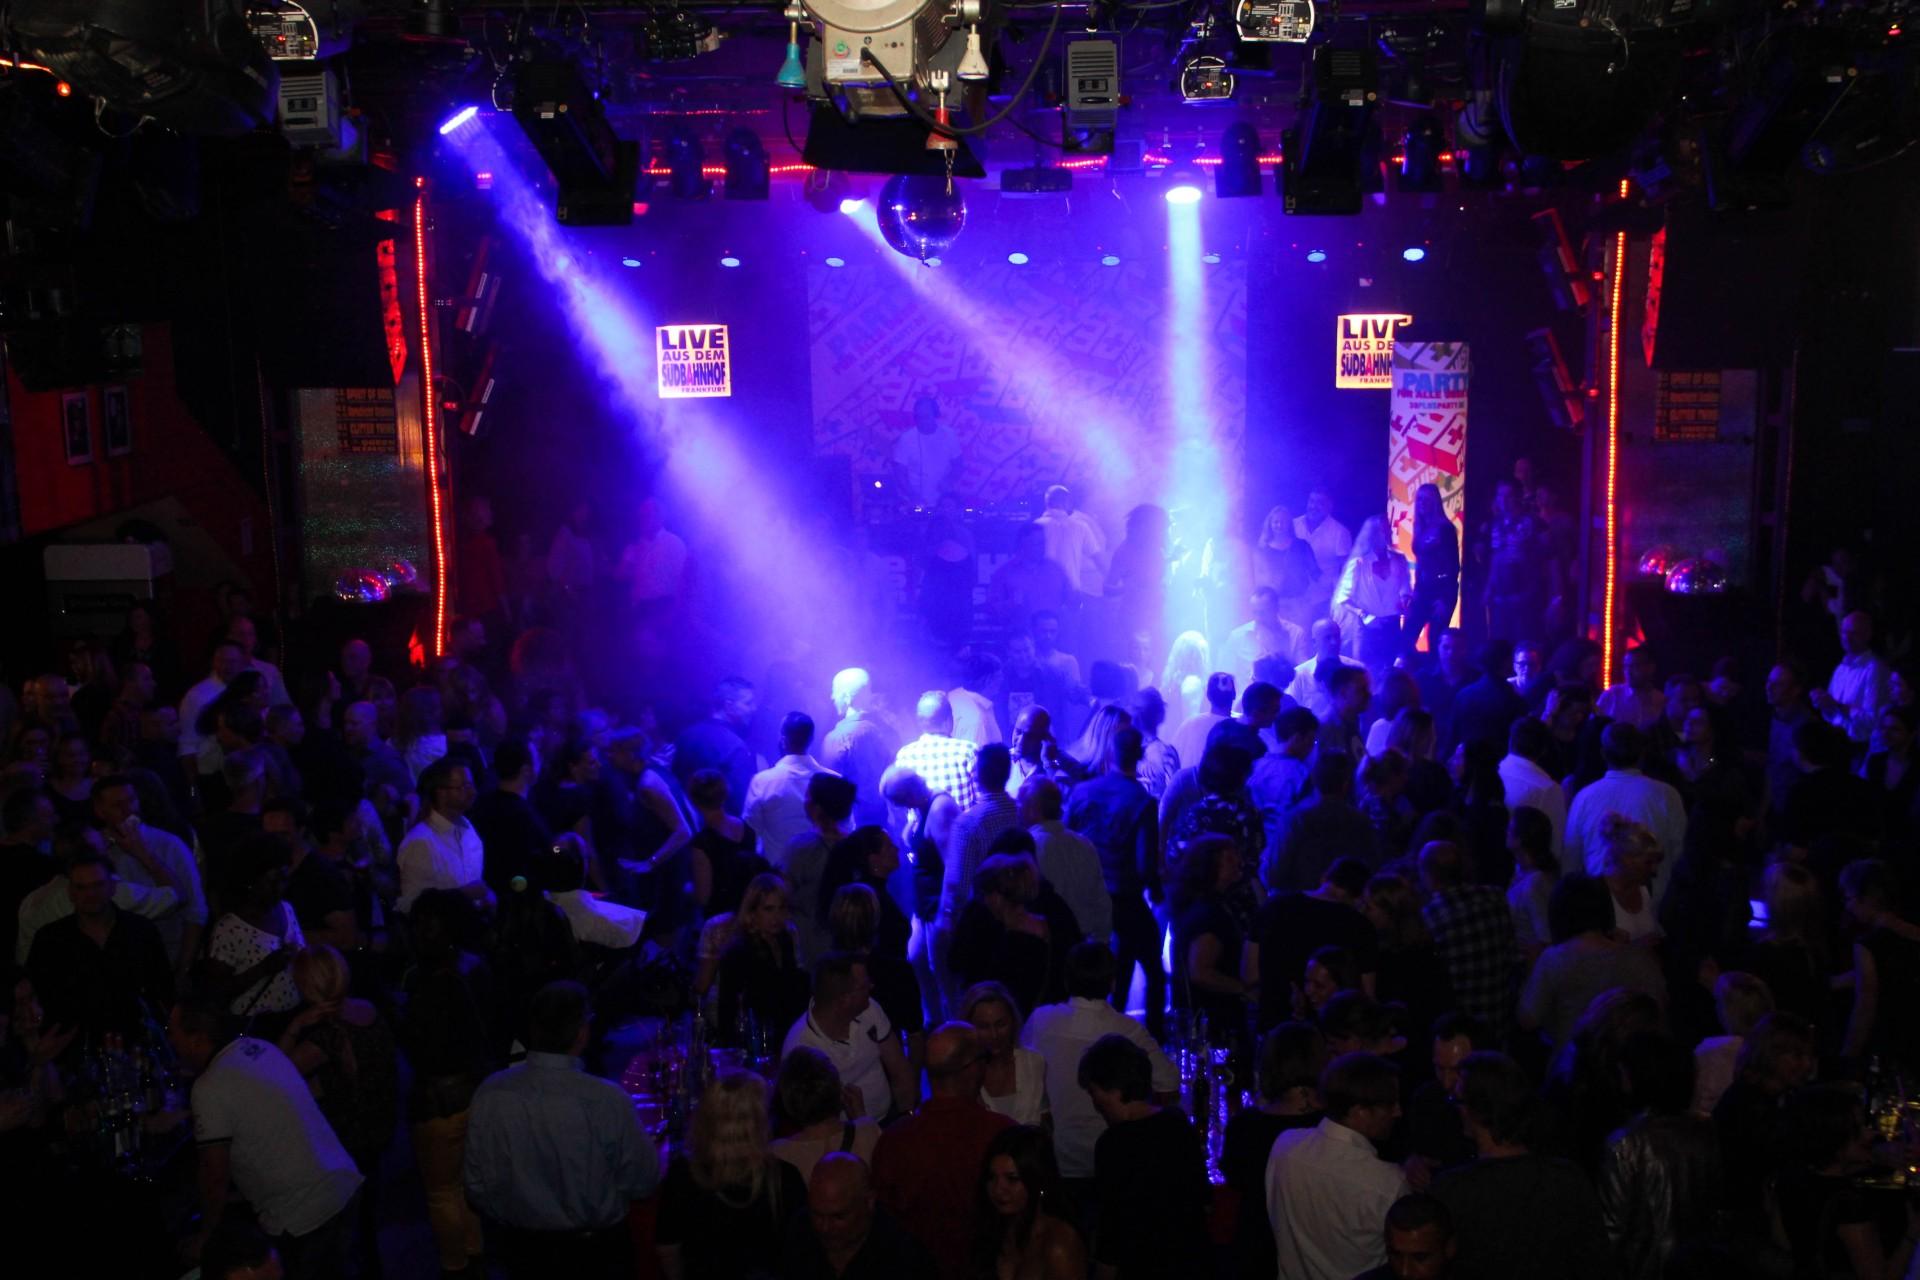 20.10.2018 - 30 Plus Party, Südbahnhof, Frankfurt am Main